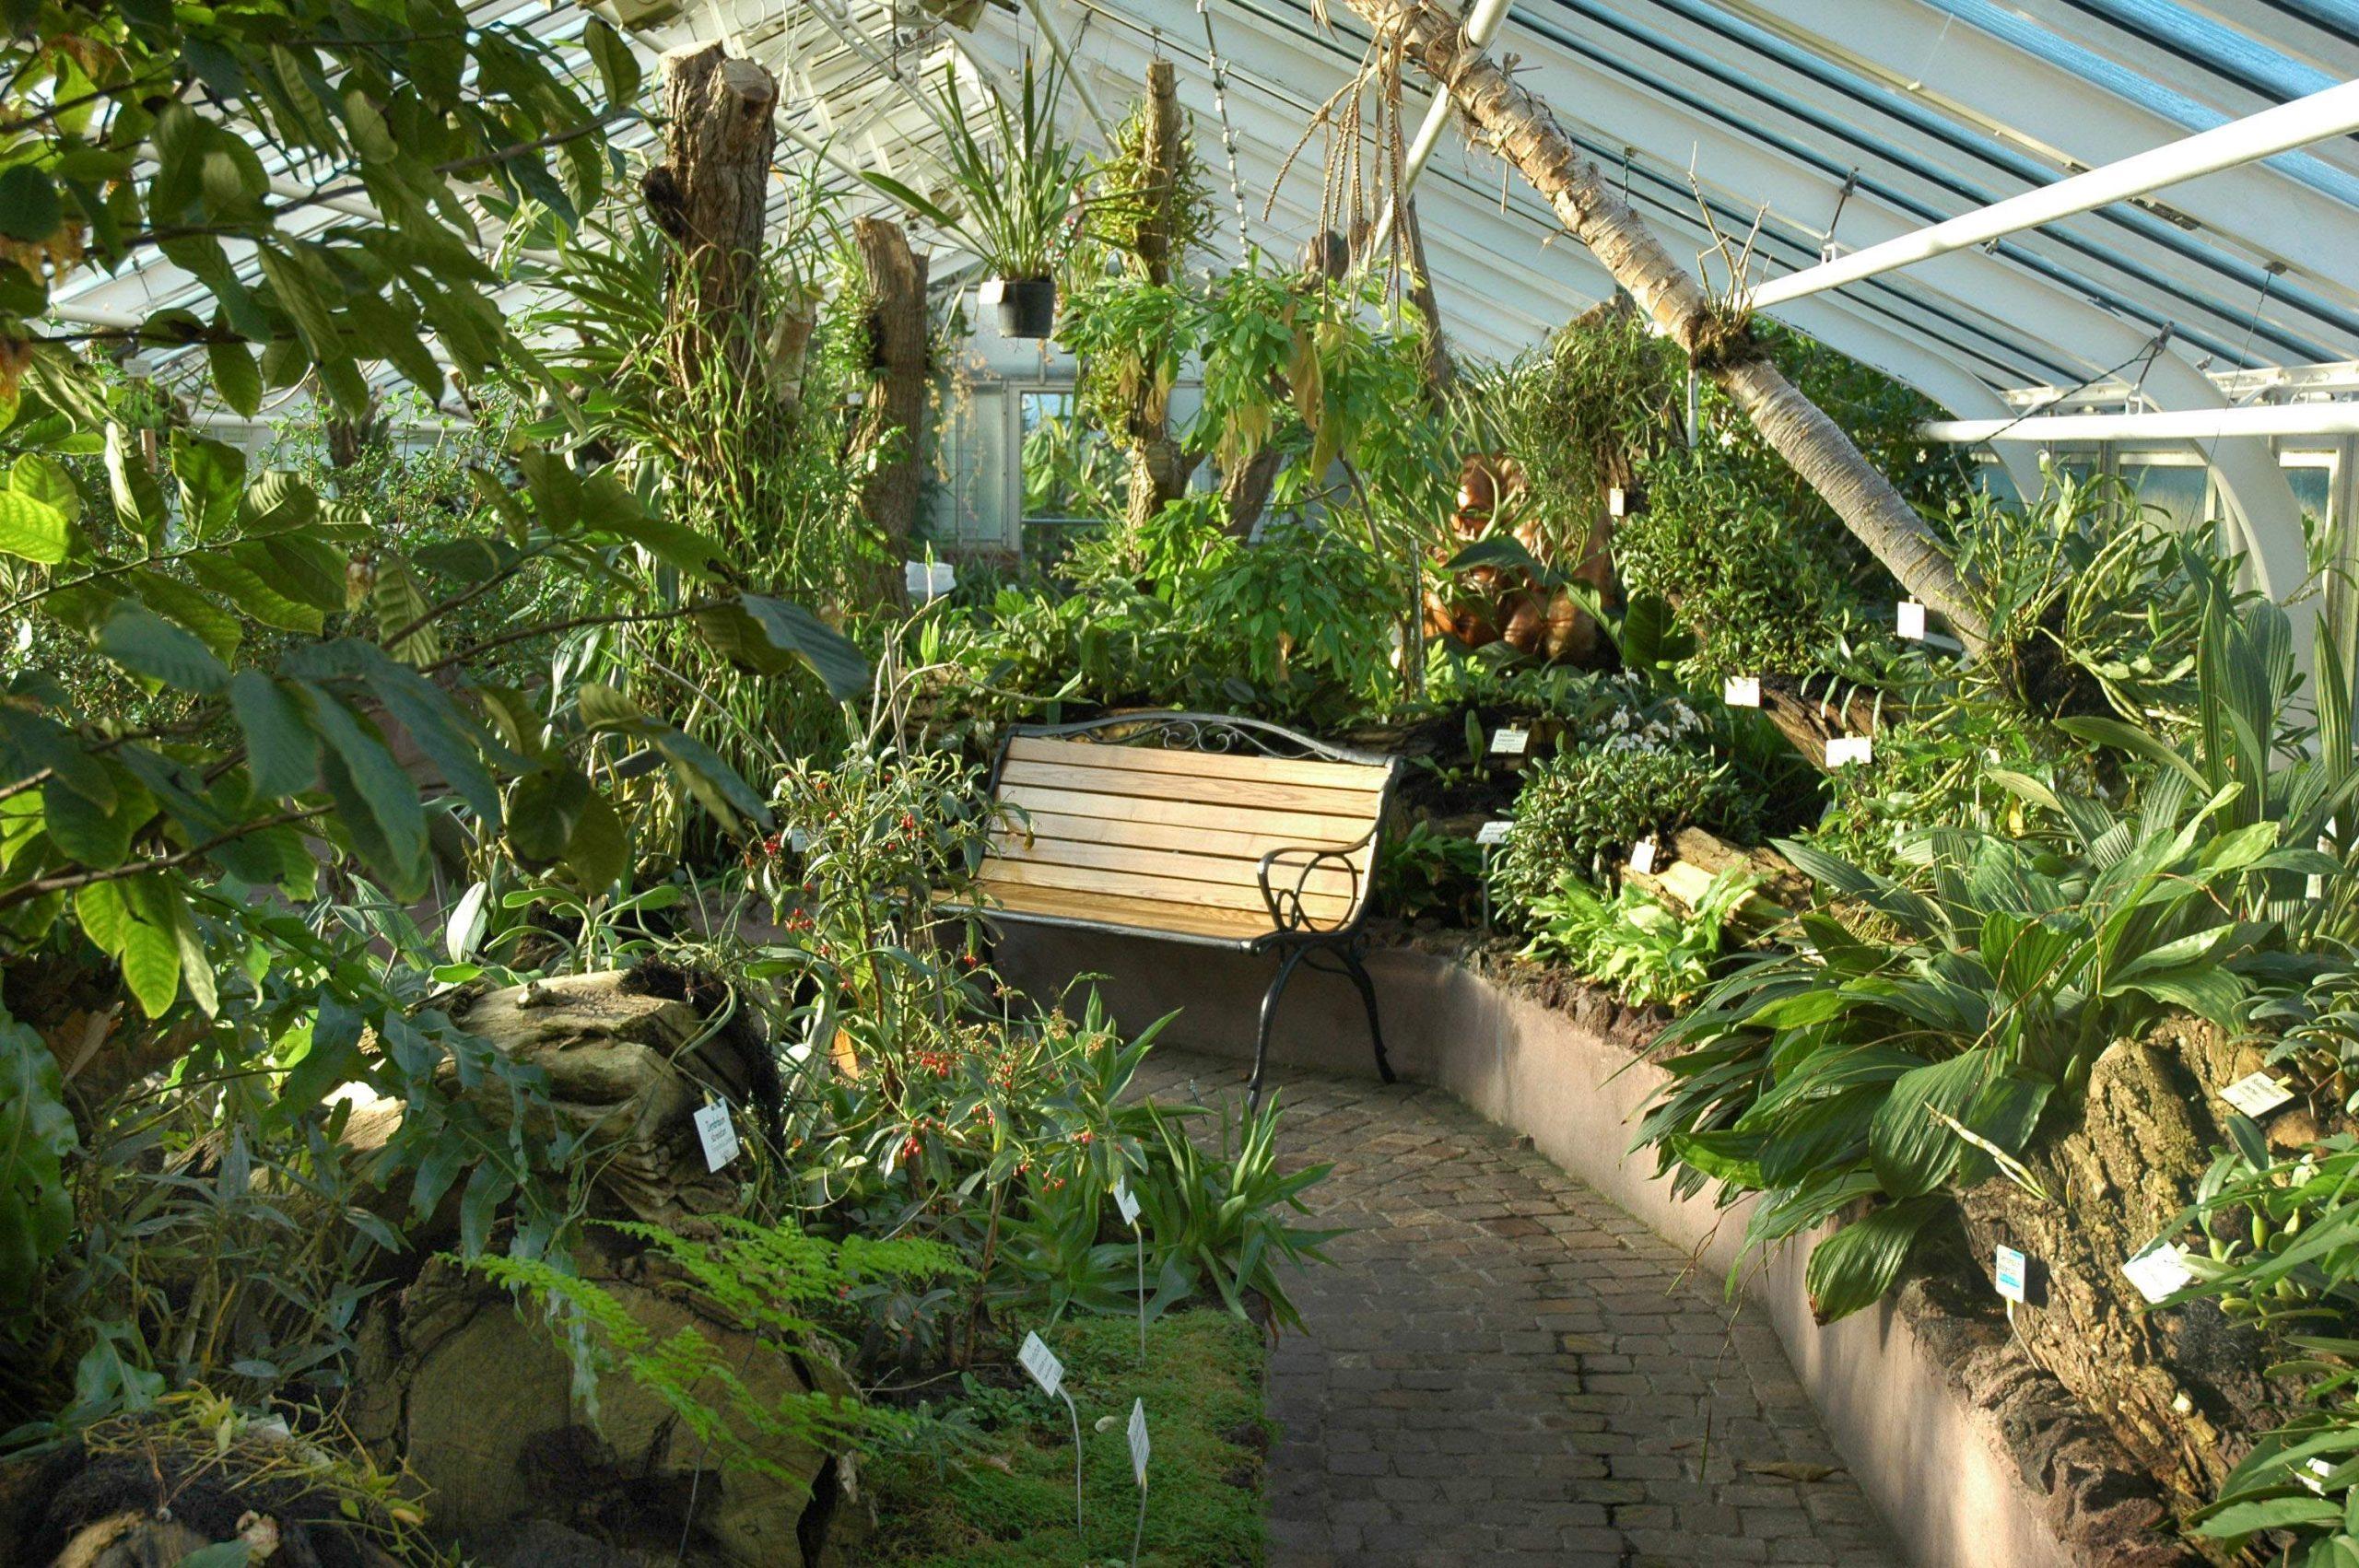 Botanischer Garten Berlin Genial Botanischer Garten Und Botanisches Museum Berlin